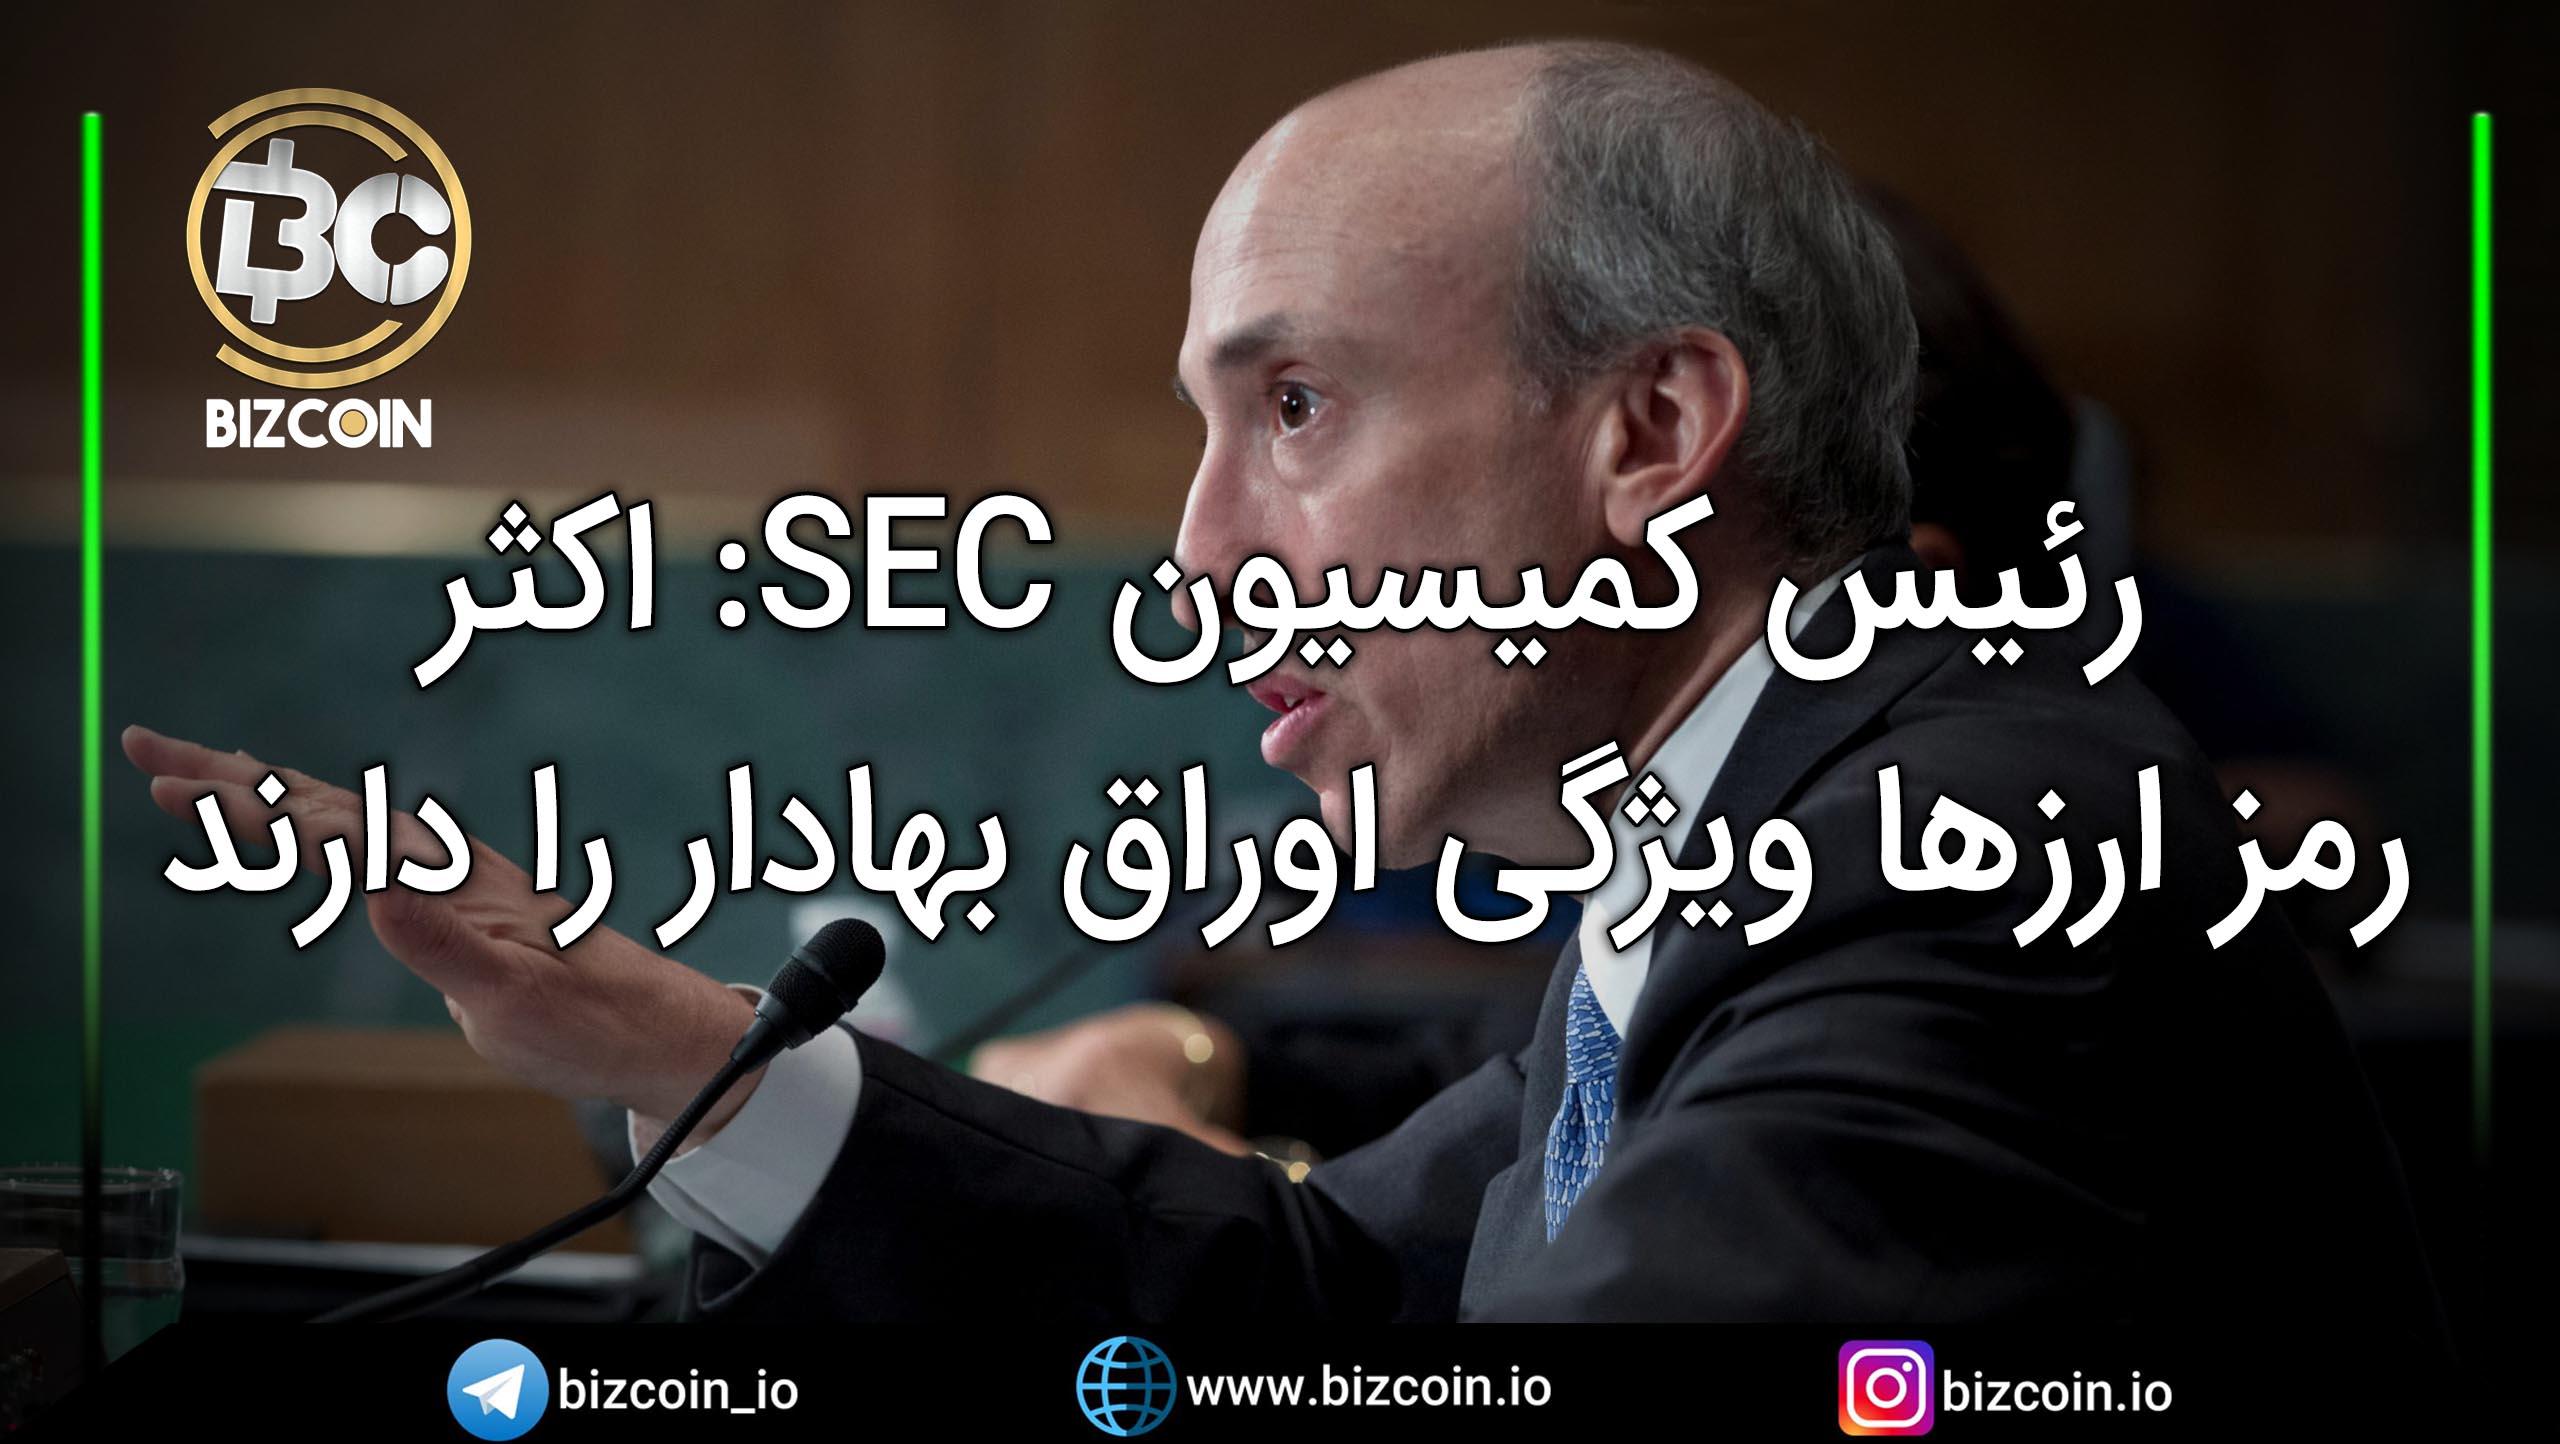 Chairman of the SEC Most cryptocurrencies have the characteristics of securities رئیس کمیسیون SEC: اکثر رمز ارزها ویژگی اوراق بهادار را دارند